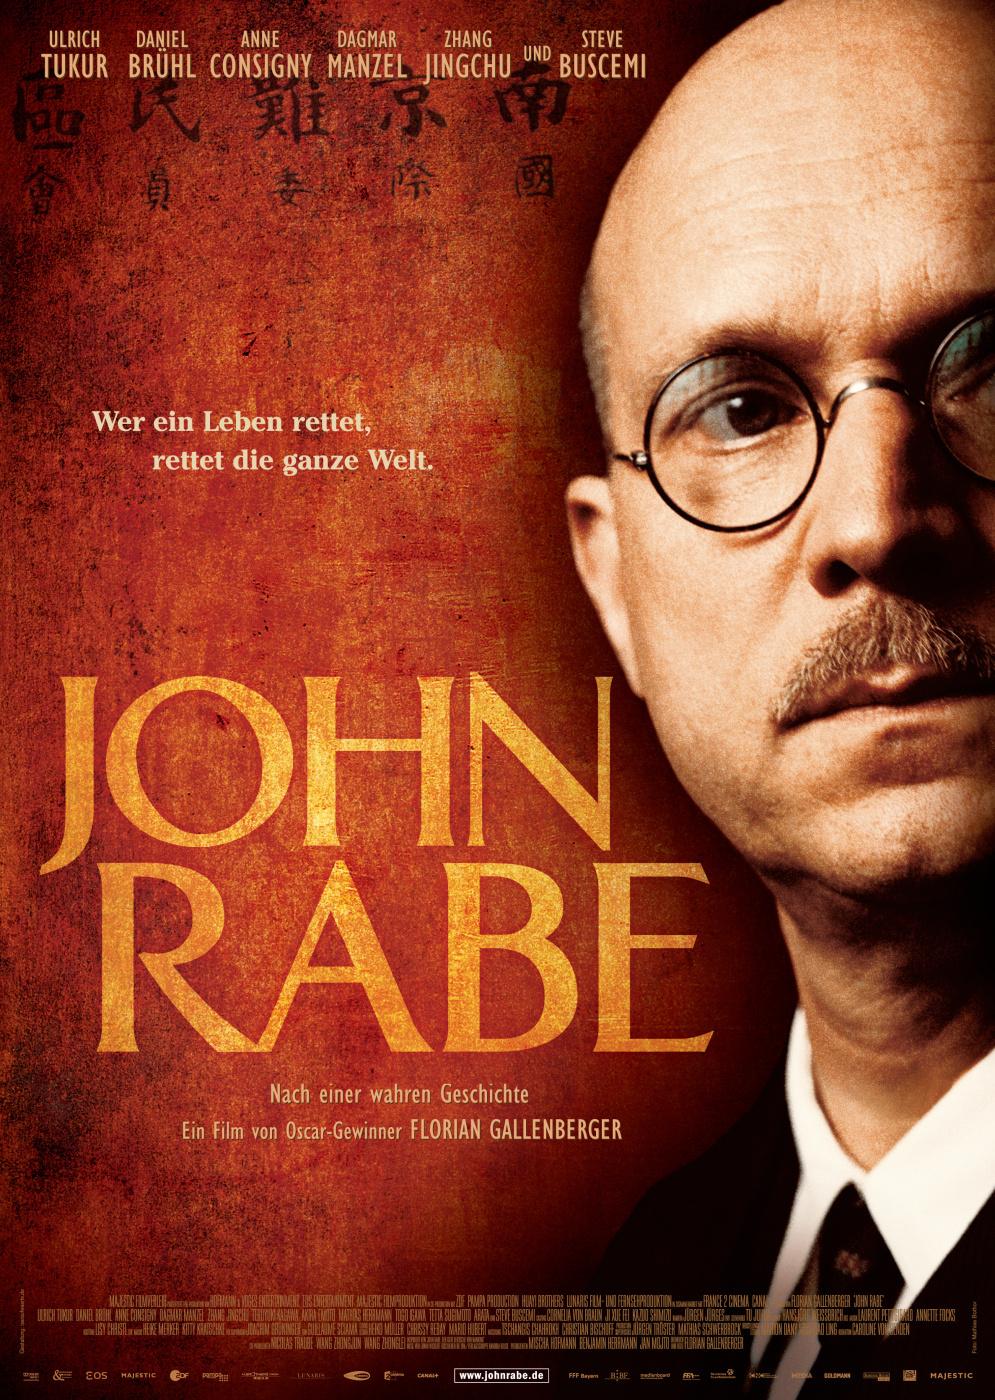 John.Rabe.2009.CN.DVDRip.XviD-PMCG.jpg